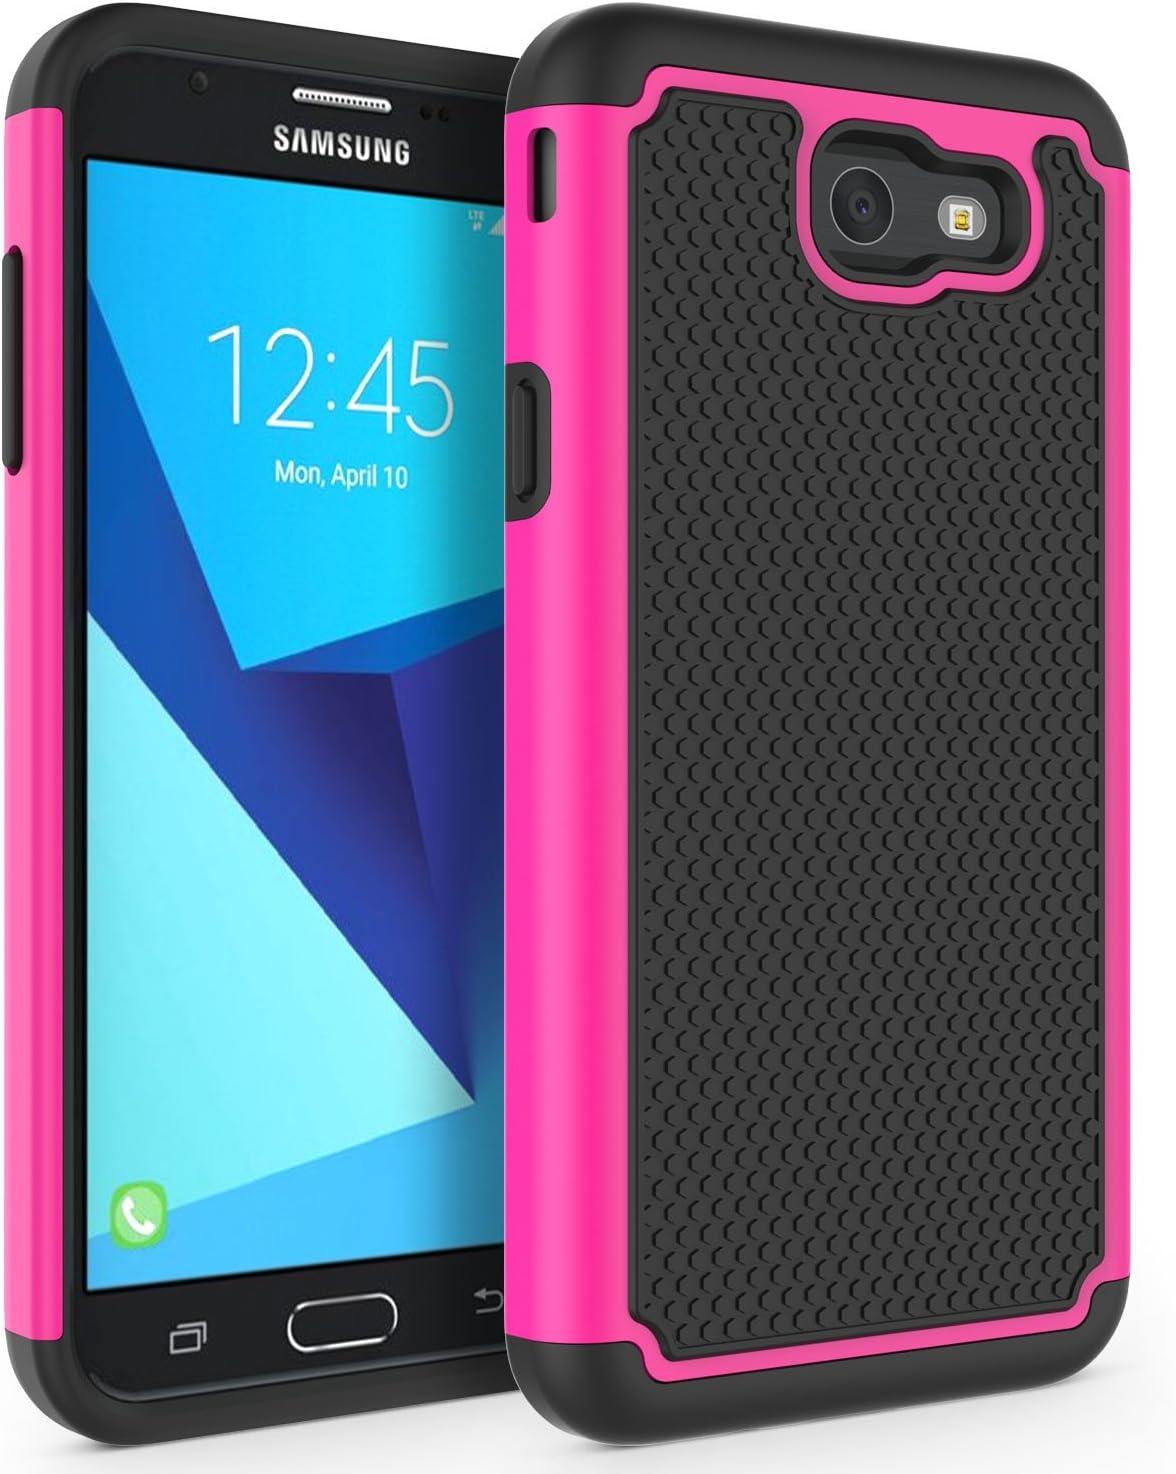 SYONER Shockproof Phone Case Cover for Samsung Galaxy J7 V 2017 (1st Gen)/ Galaxy J7 2017 / Galaxy J7 Prime/Galaxy J7 Perx/Galaxy J7 Sky Pro/Galaxy Halo [Hot Pink]